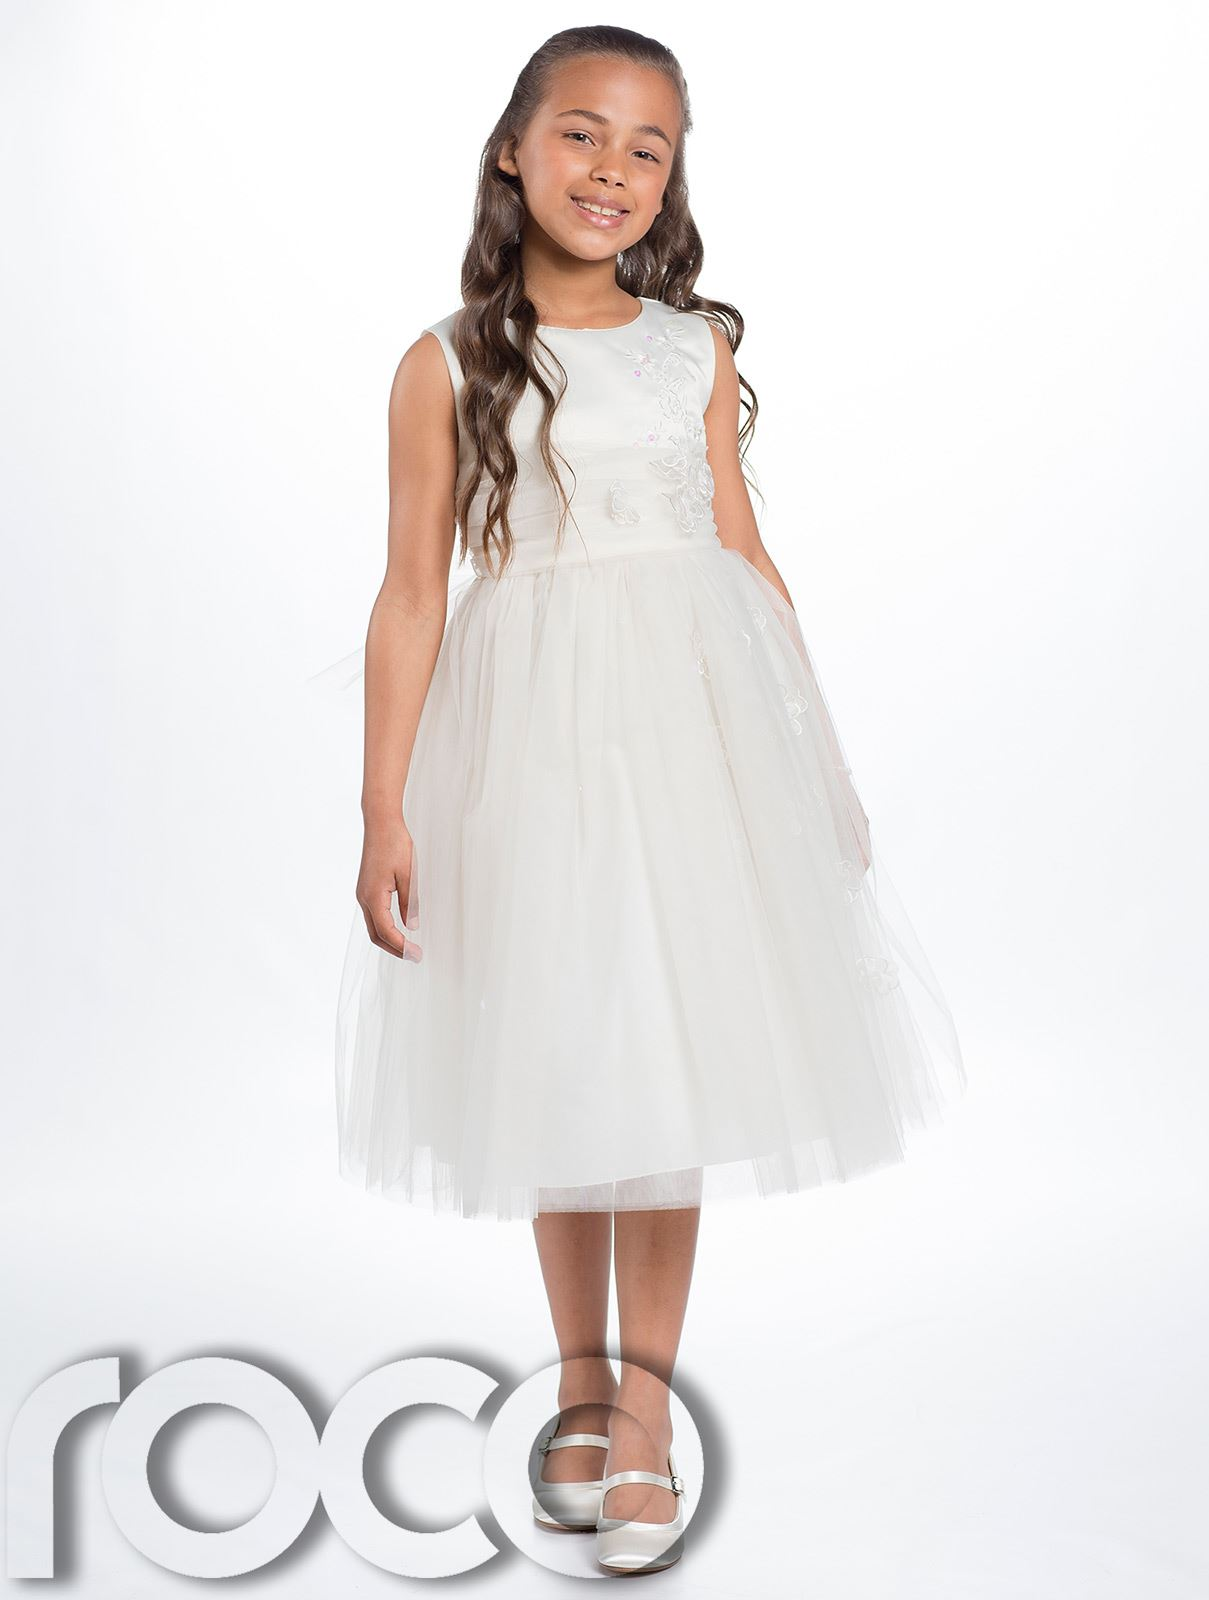 Fleur filles robe demoiselle d 39 honneur robes filles robe for Fille fleur robes mariage